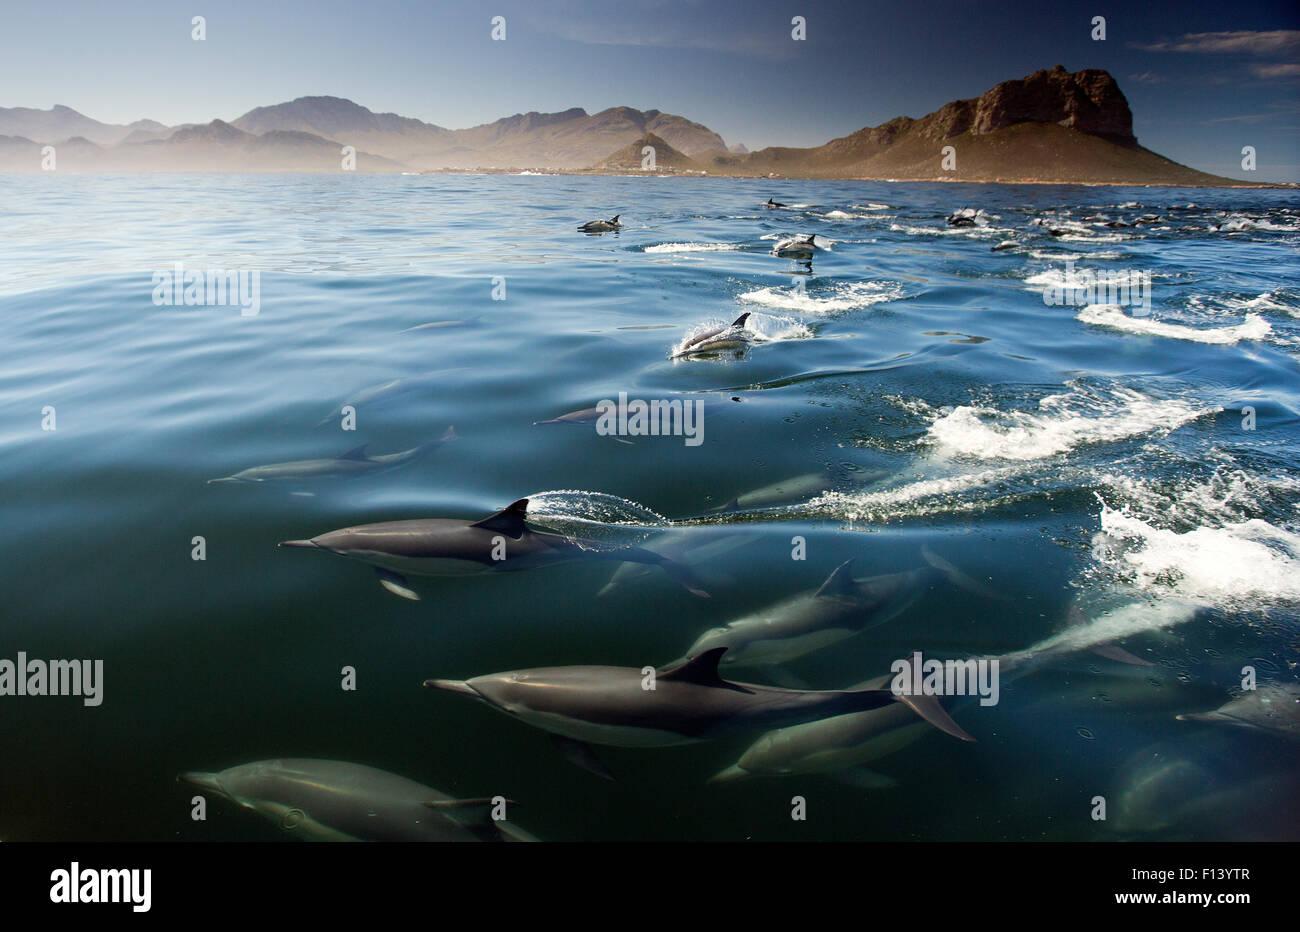 Gemeinsamen Delphin (Delphinus Delphis) False Bay, Cape Town, Südafrika Stockbild